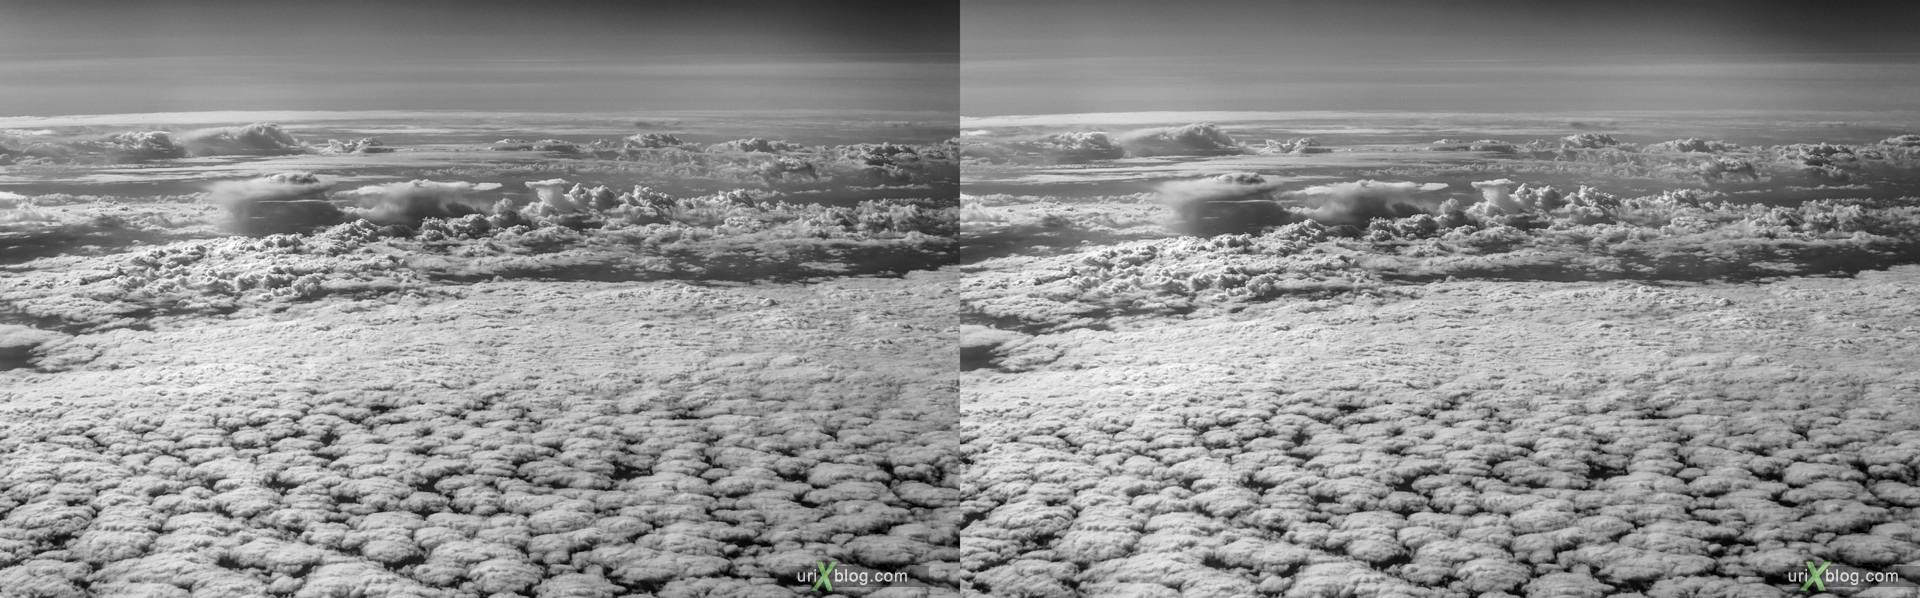 2013, Atlantic ocean, Norwegian sea, panorama, airplane, black and white, bw, snow, ice, clouds, horizon, 3D, stereo pair, cross-eyed, crossview, cross view stereo pair, stereoscopic